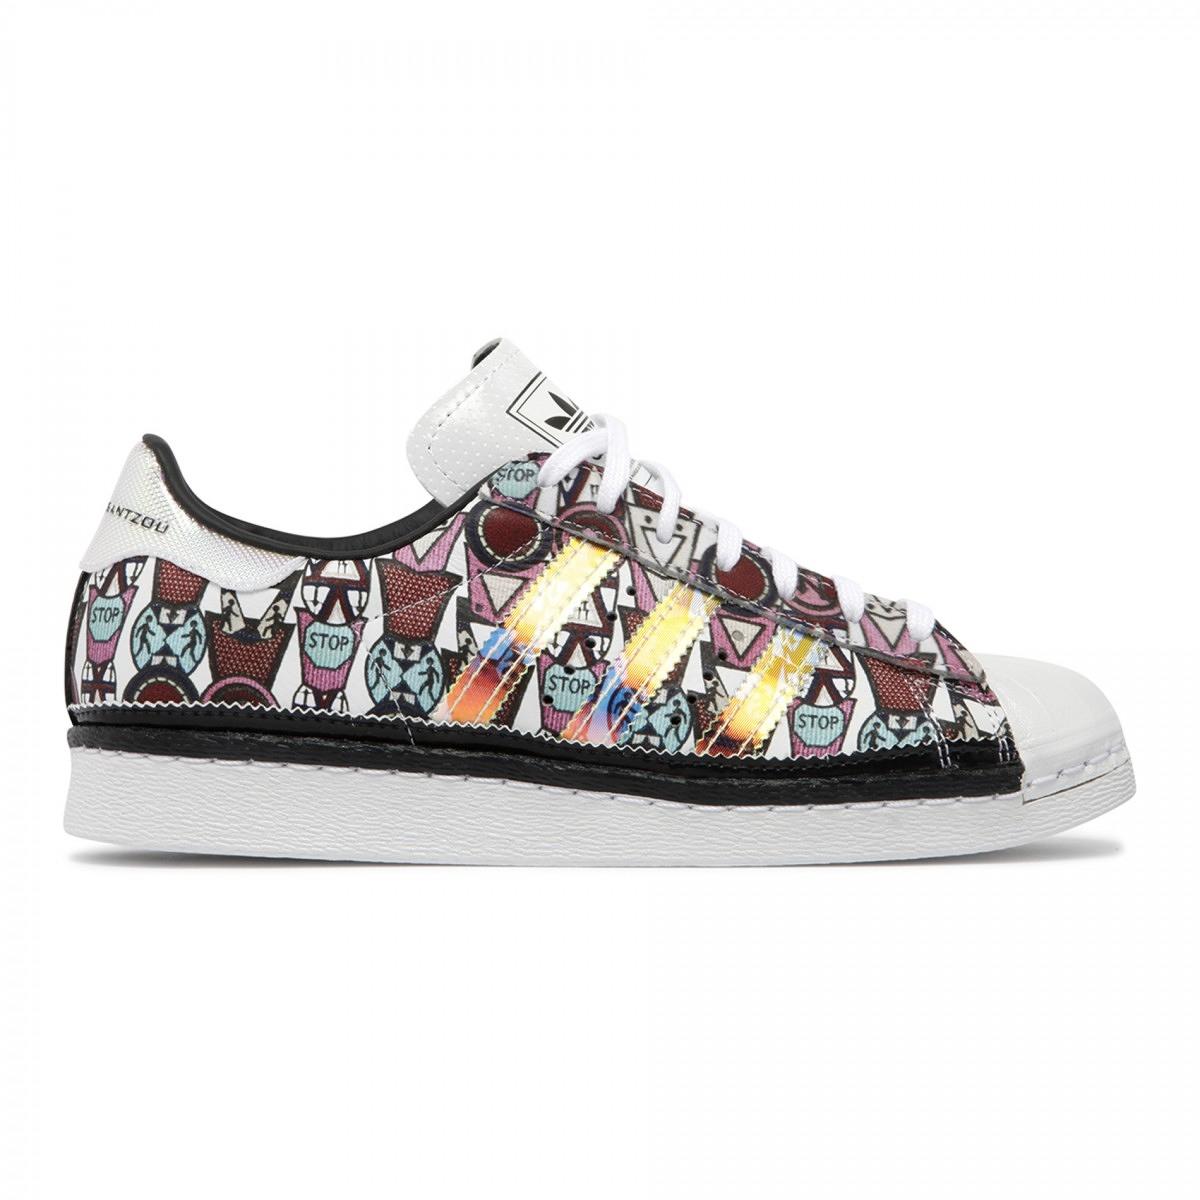 Adidas Canvas Shoes Amazon